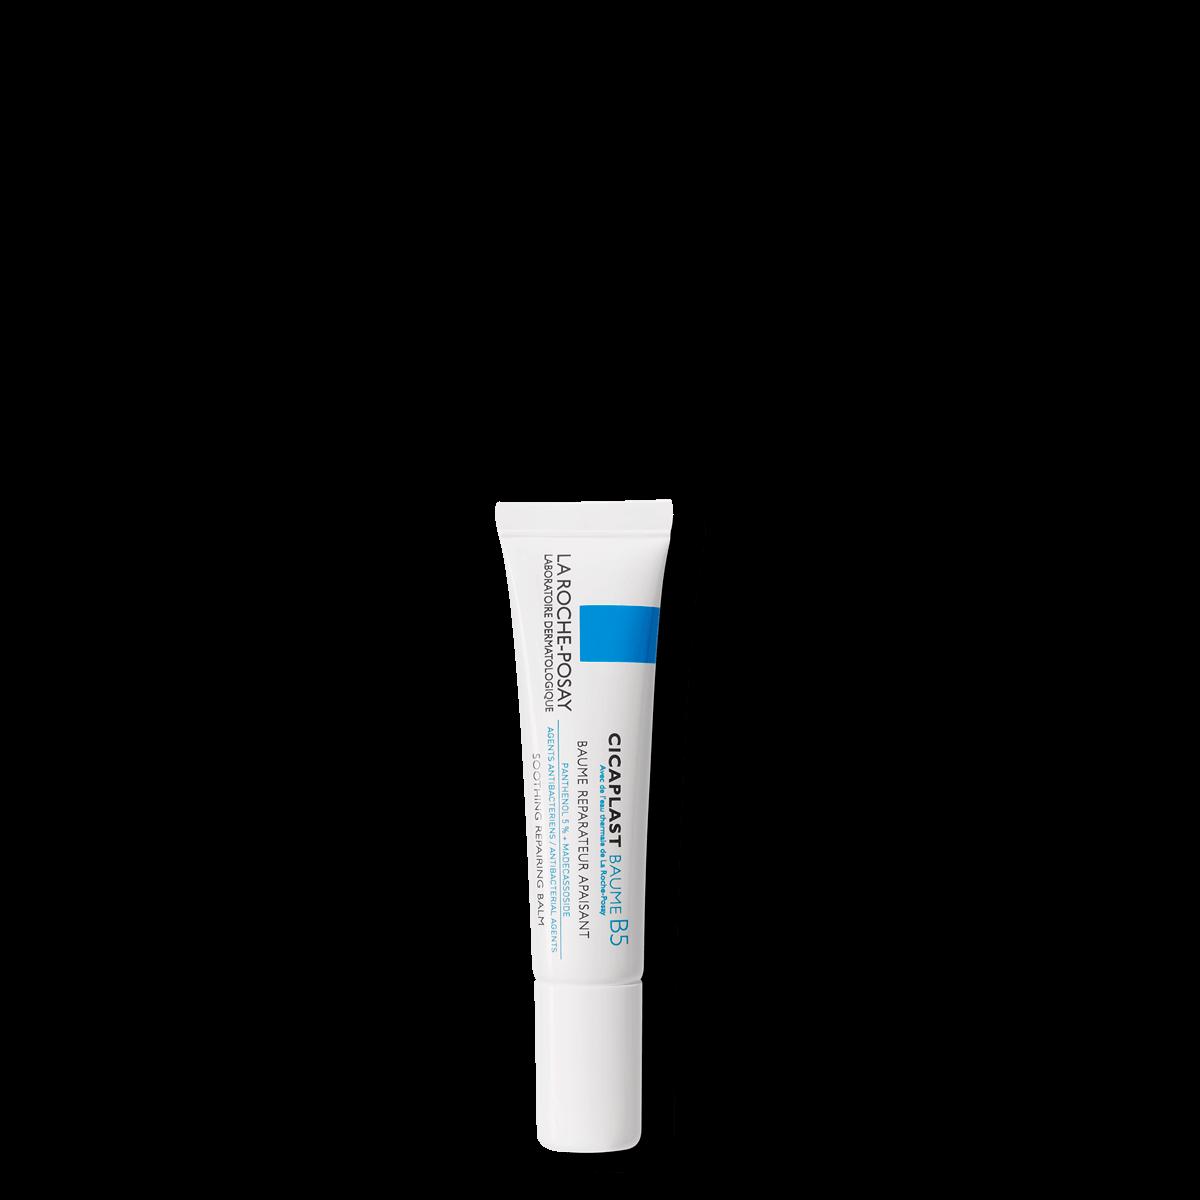 La Roche Posay Produktsida Småskador Cicaplast Baume B5 15ml 33378724187